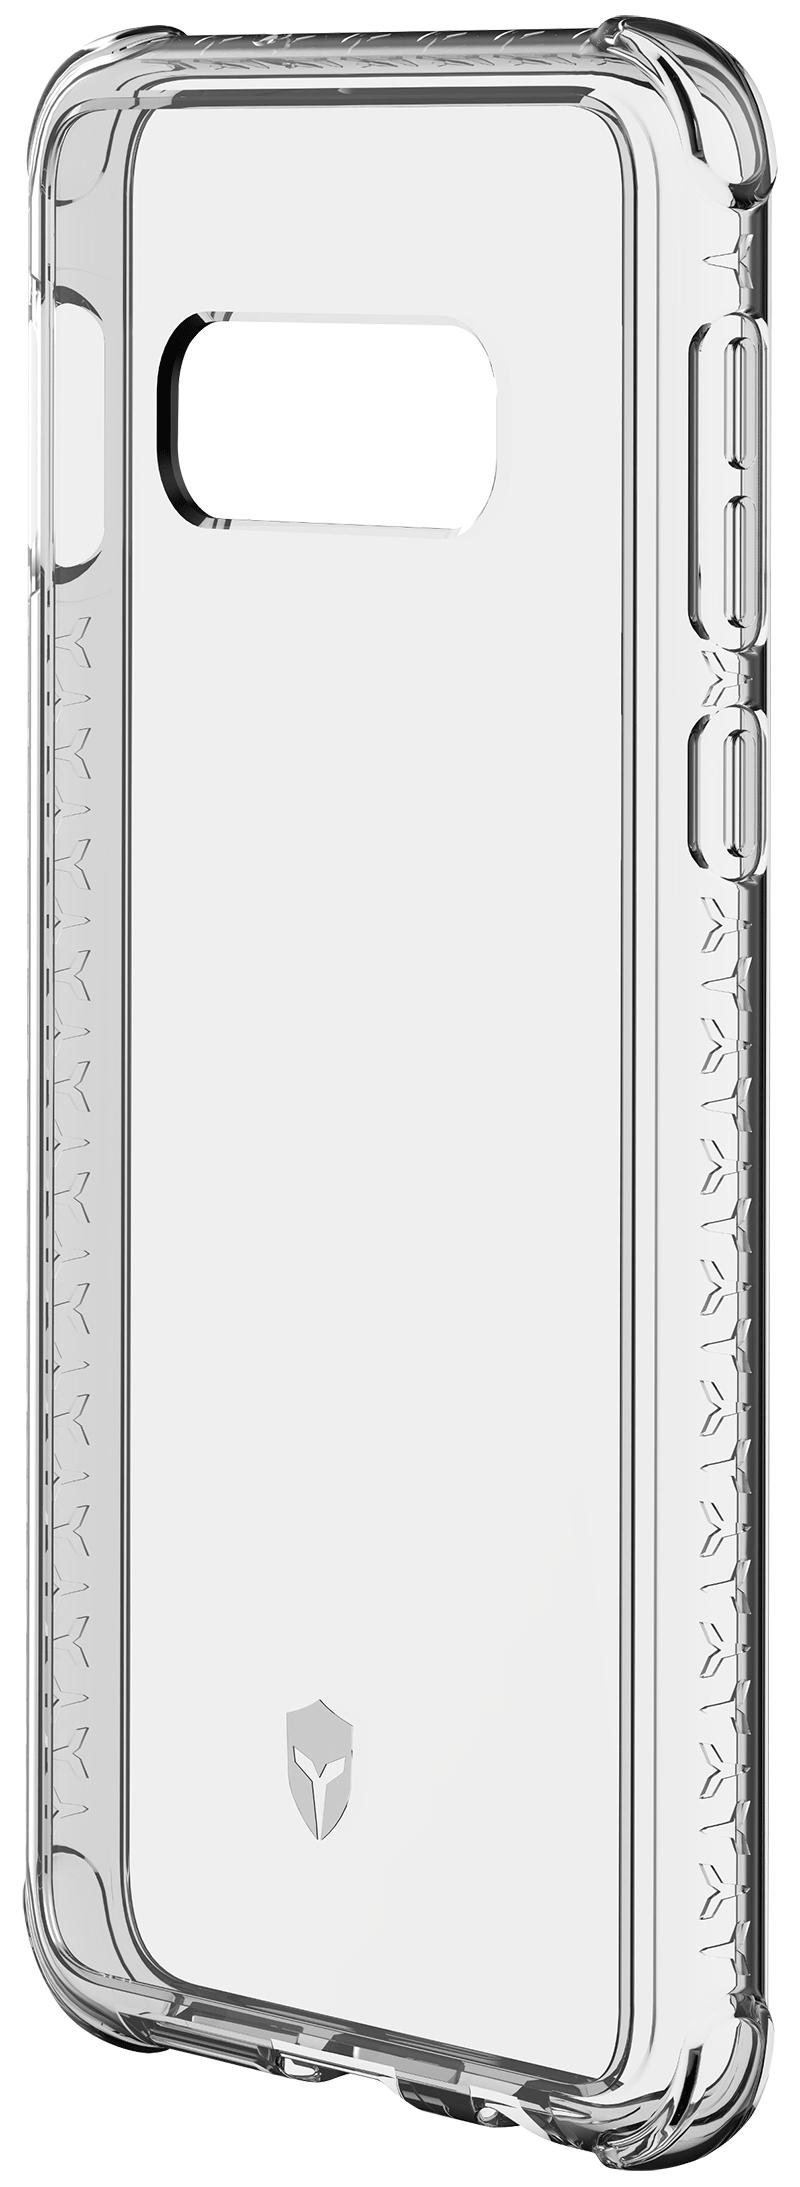 Coque Force Case Air Galaxy S10e transparente